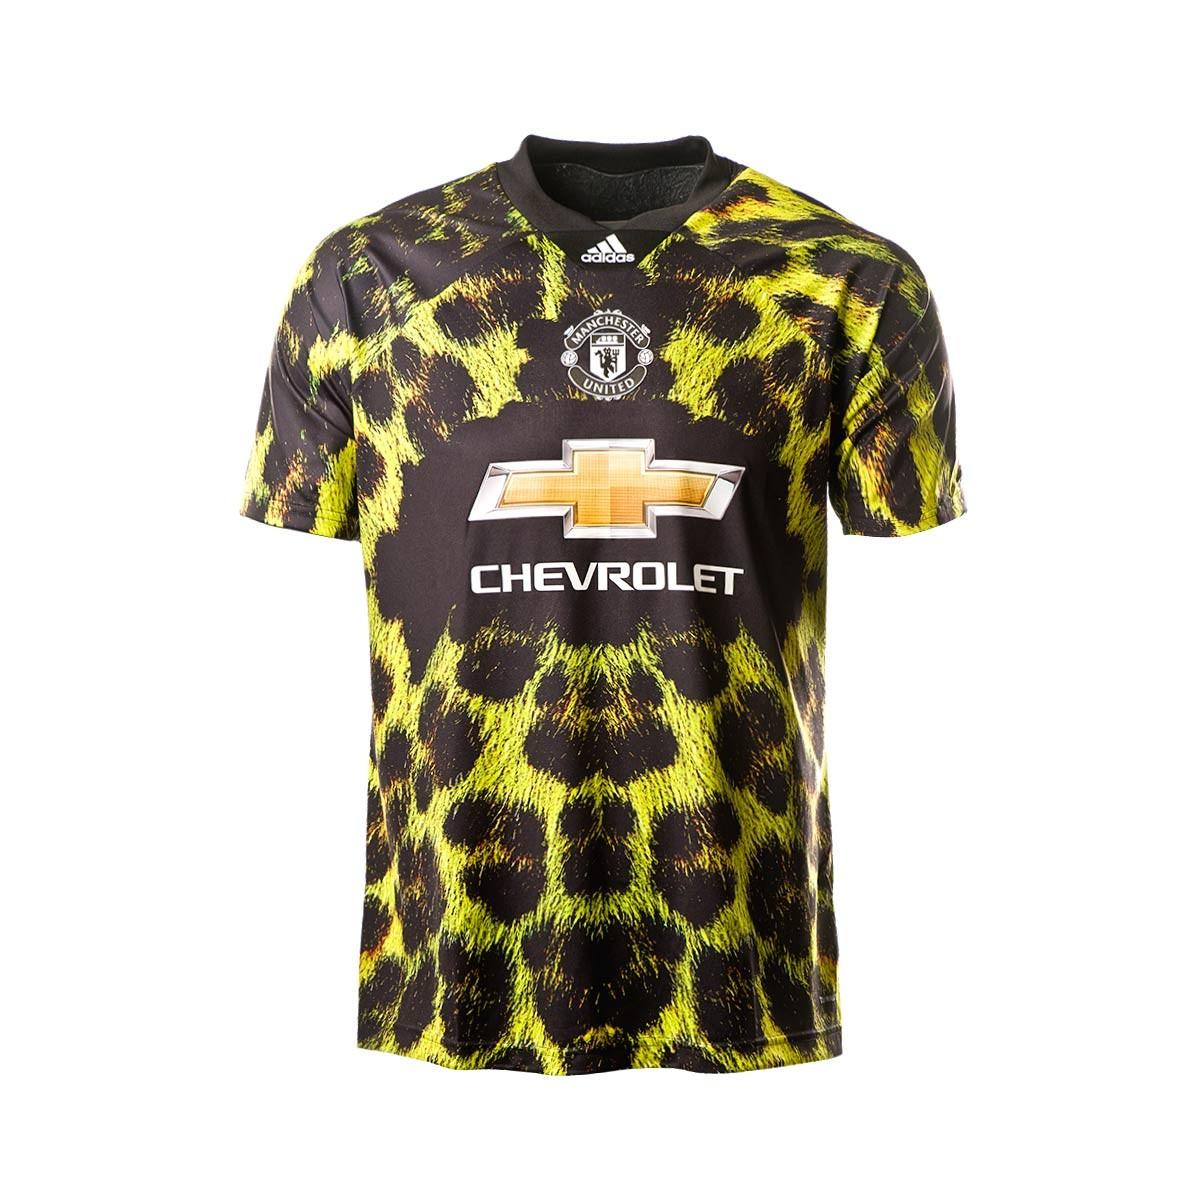 ... Camiseta Manchester United FC EA 2018-2019 Amarillo-Negro. Categorías  de la Camiseta b86d7d22209db